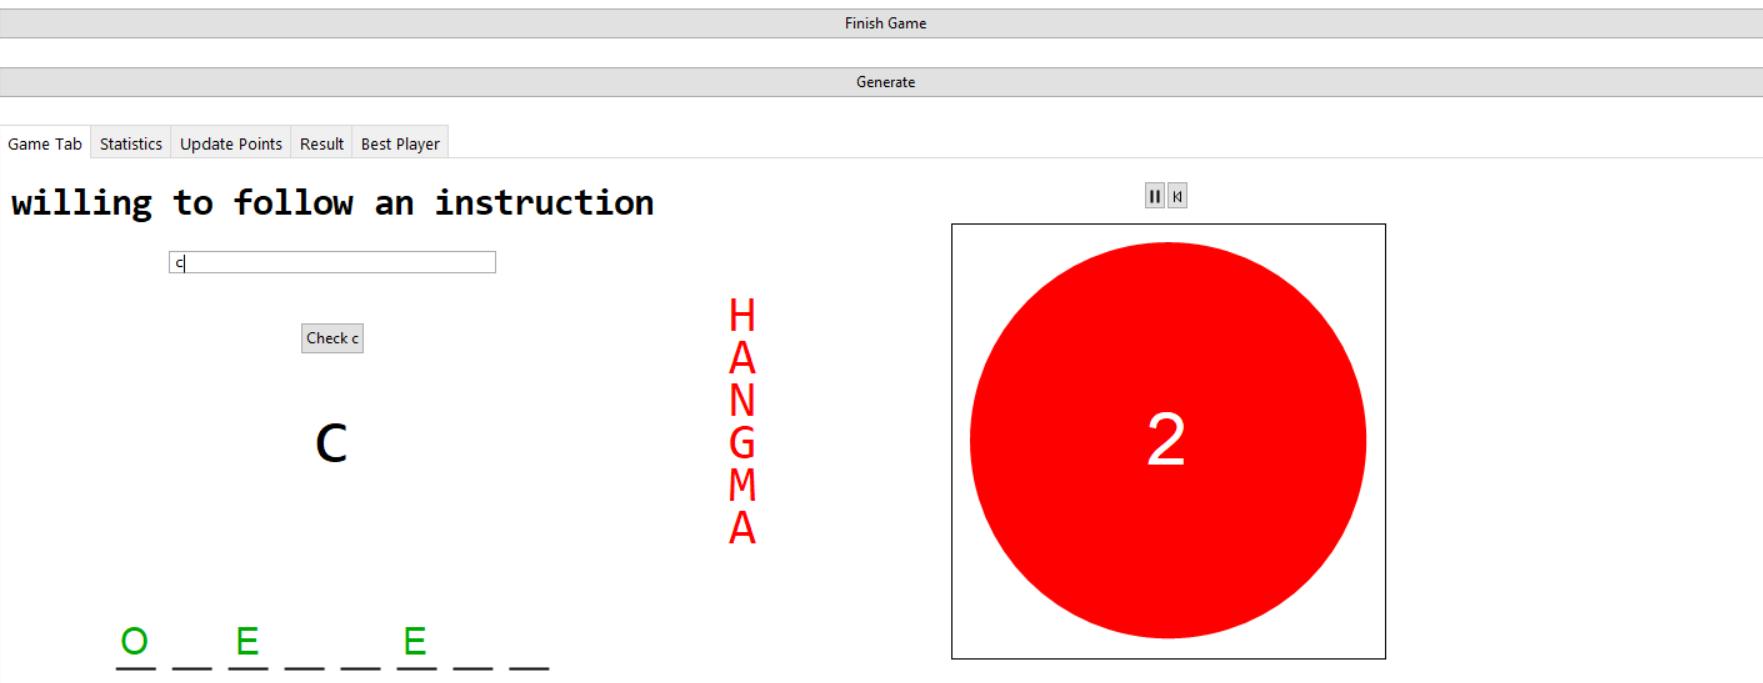 Hangman - Image 2